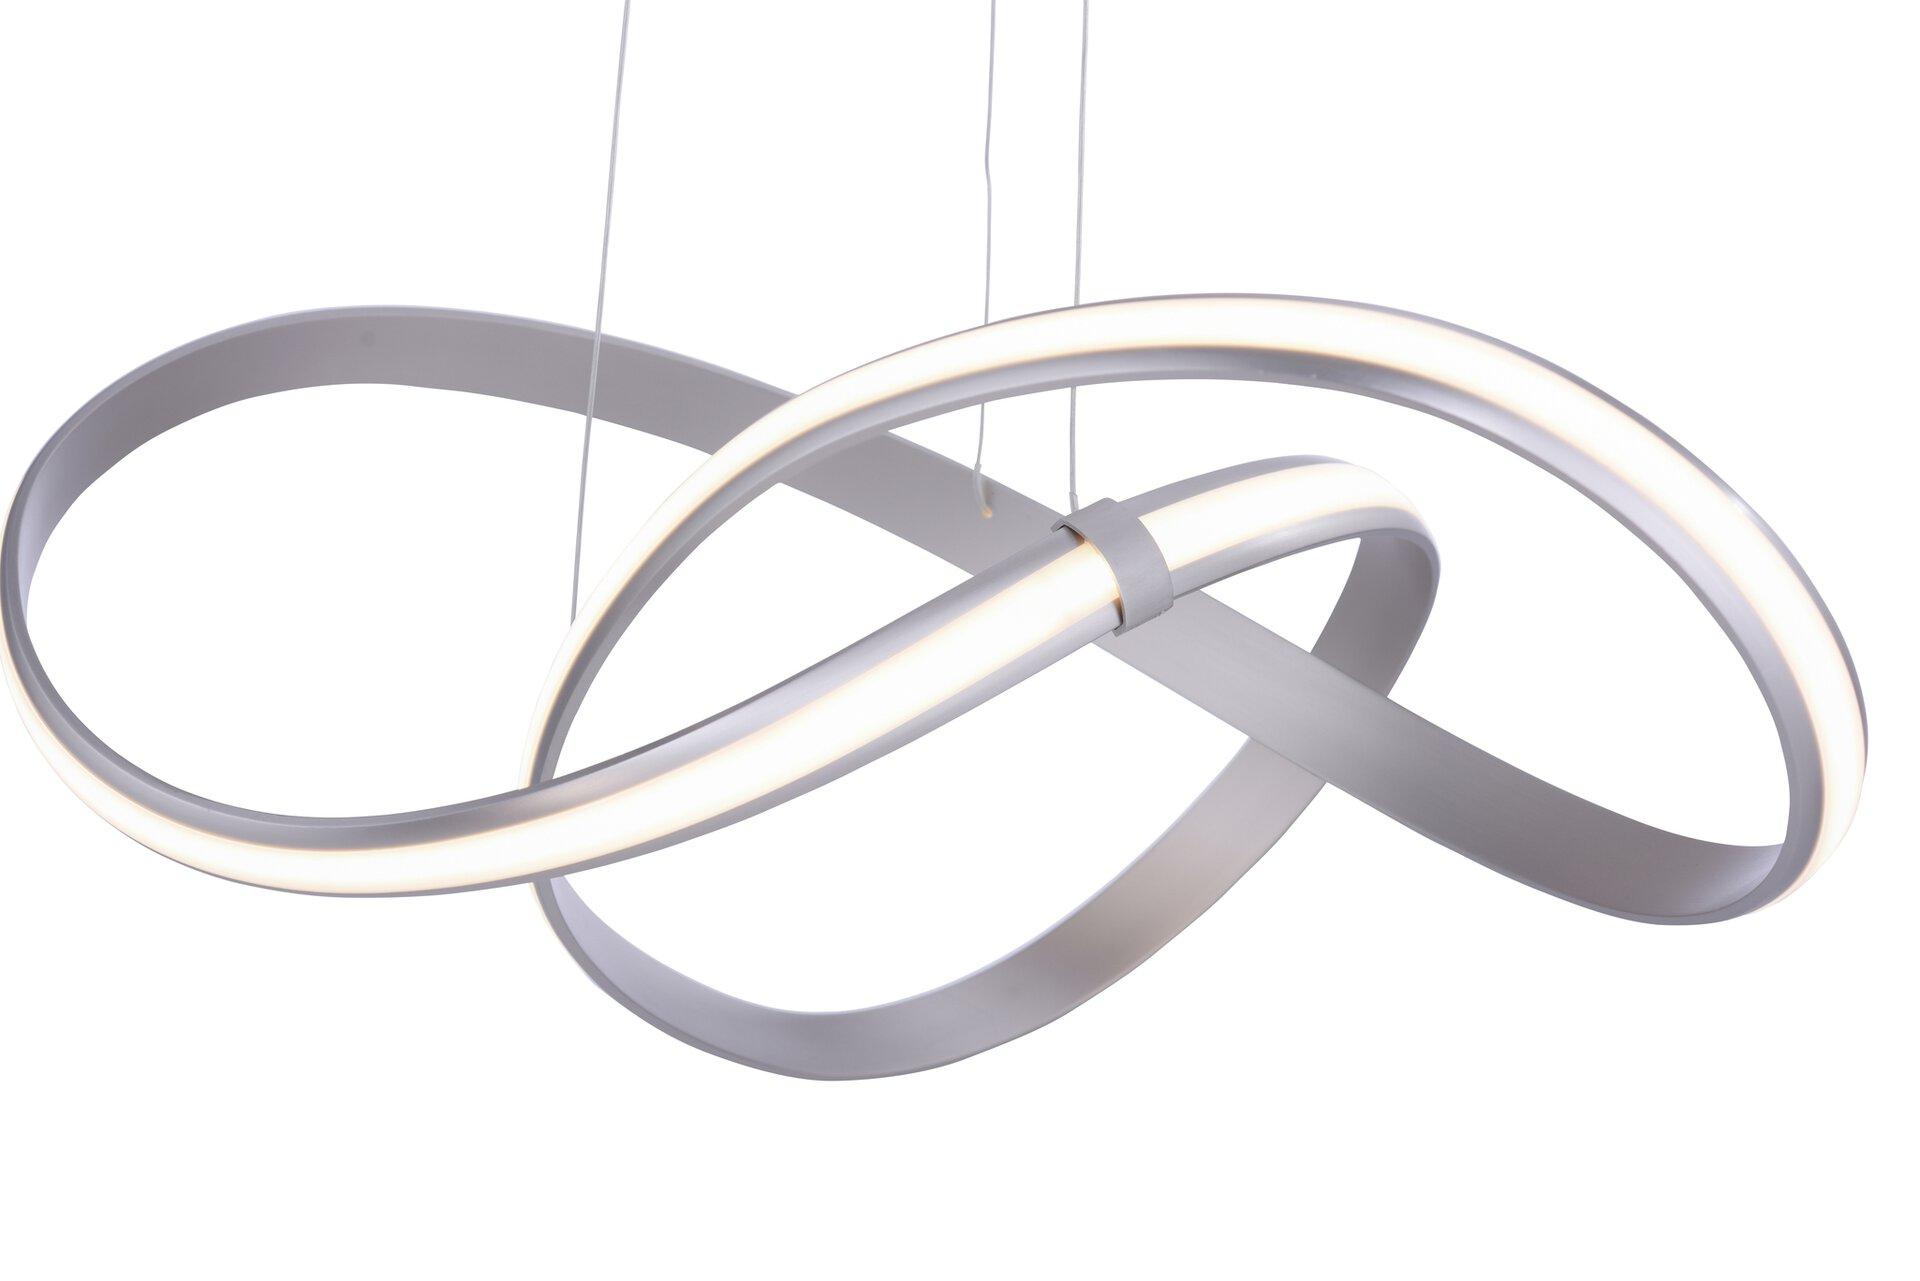 Hängeleuchte MELINDA Paul Neuhaus Metall silber 57 x 120 x 57 cm